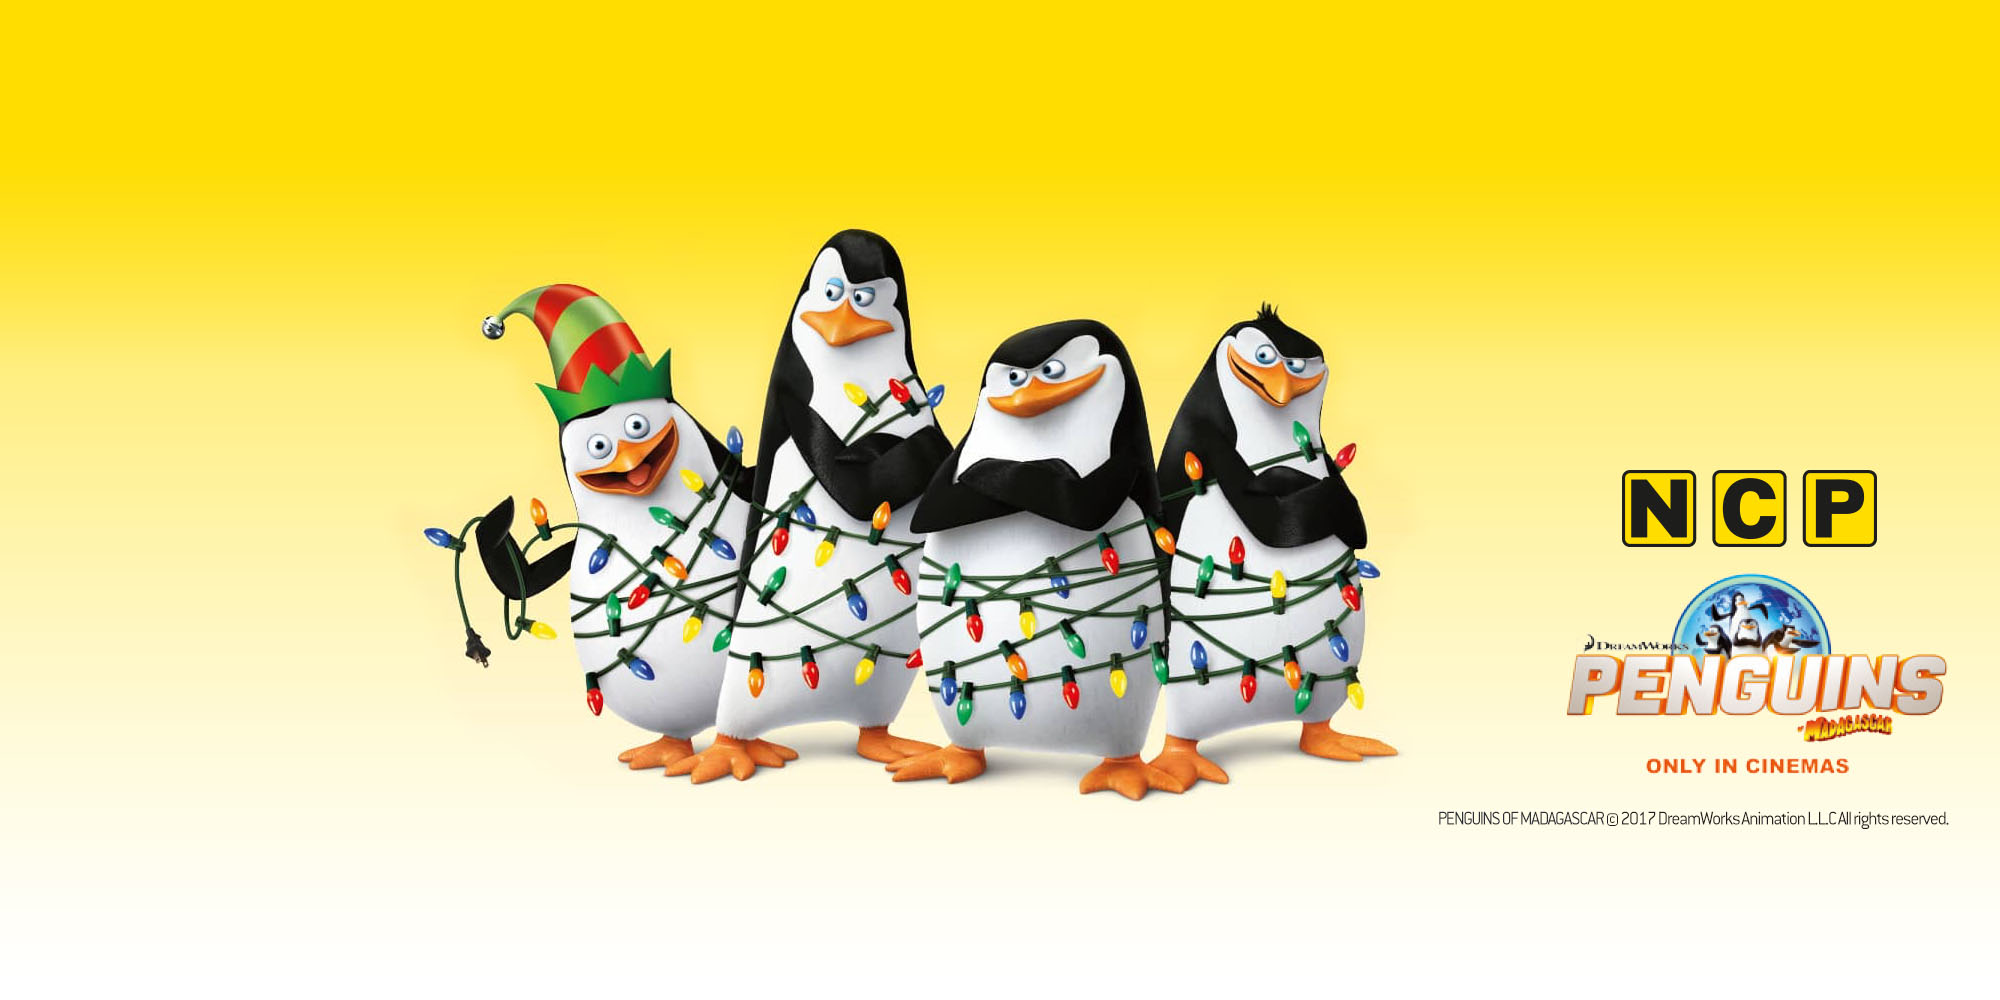 NCP Penguins